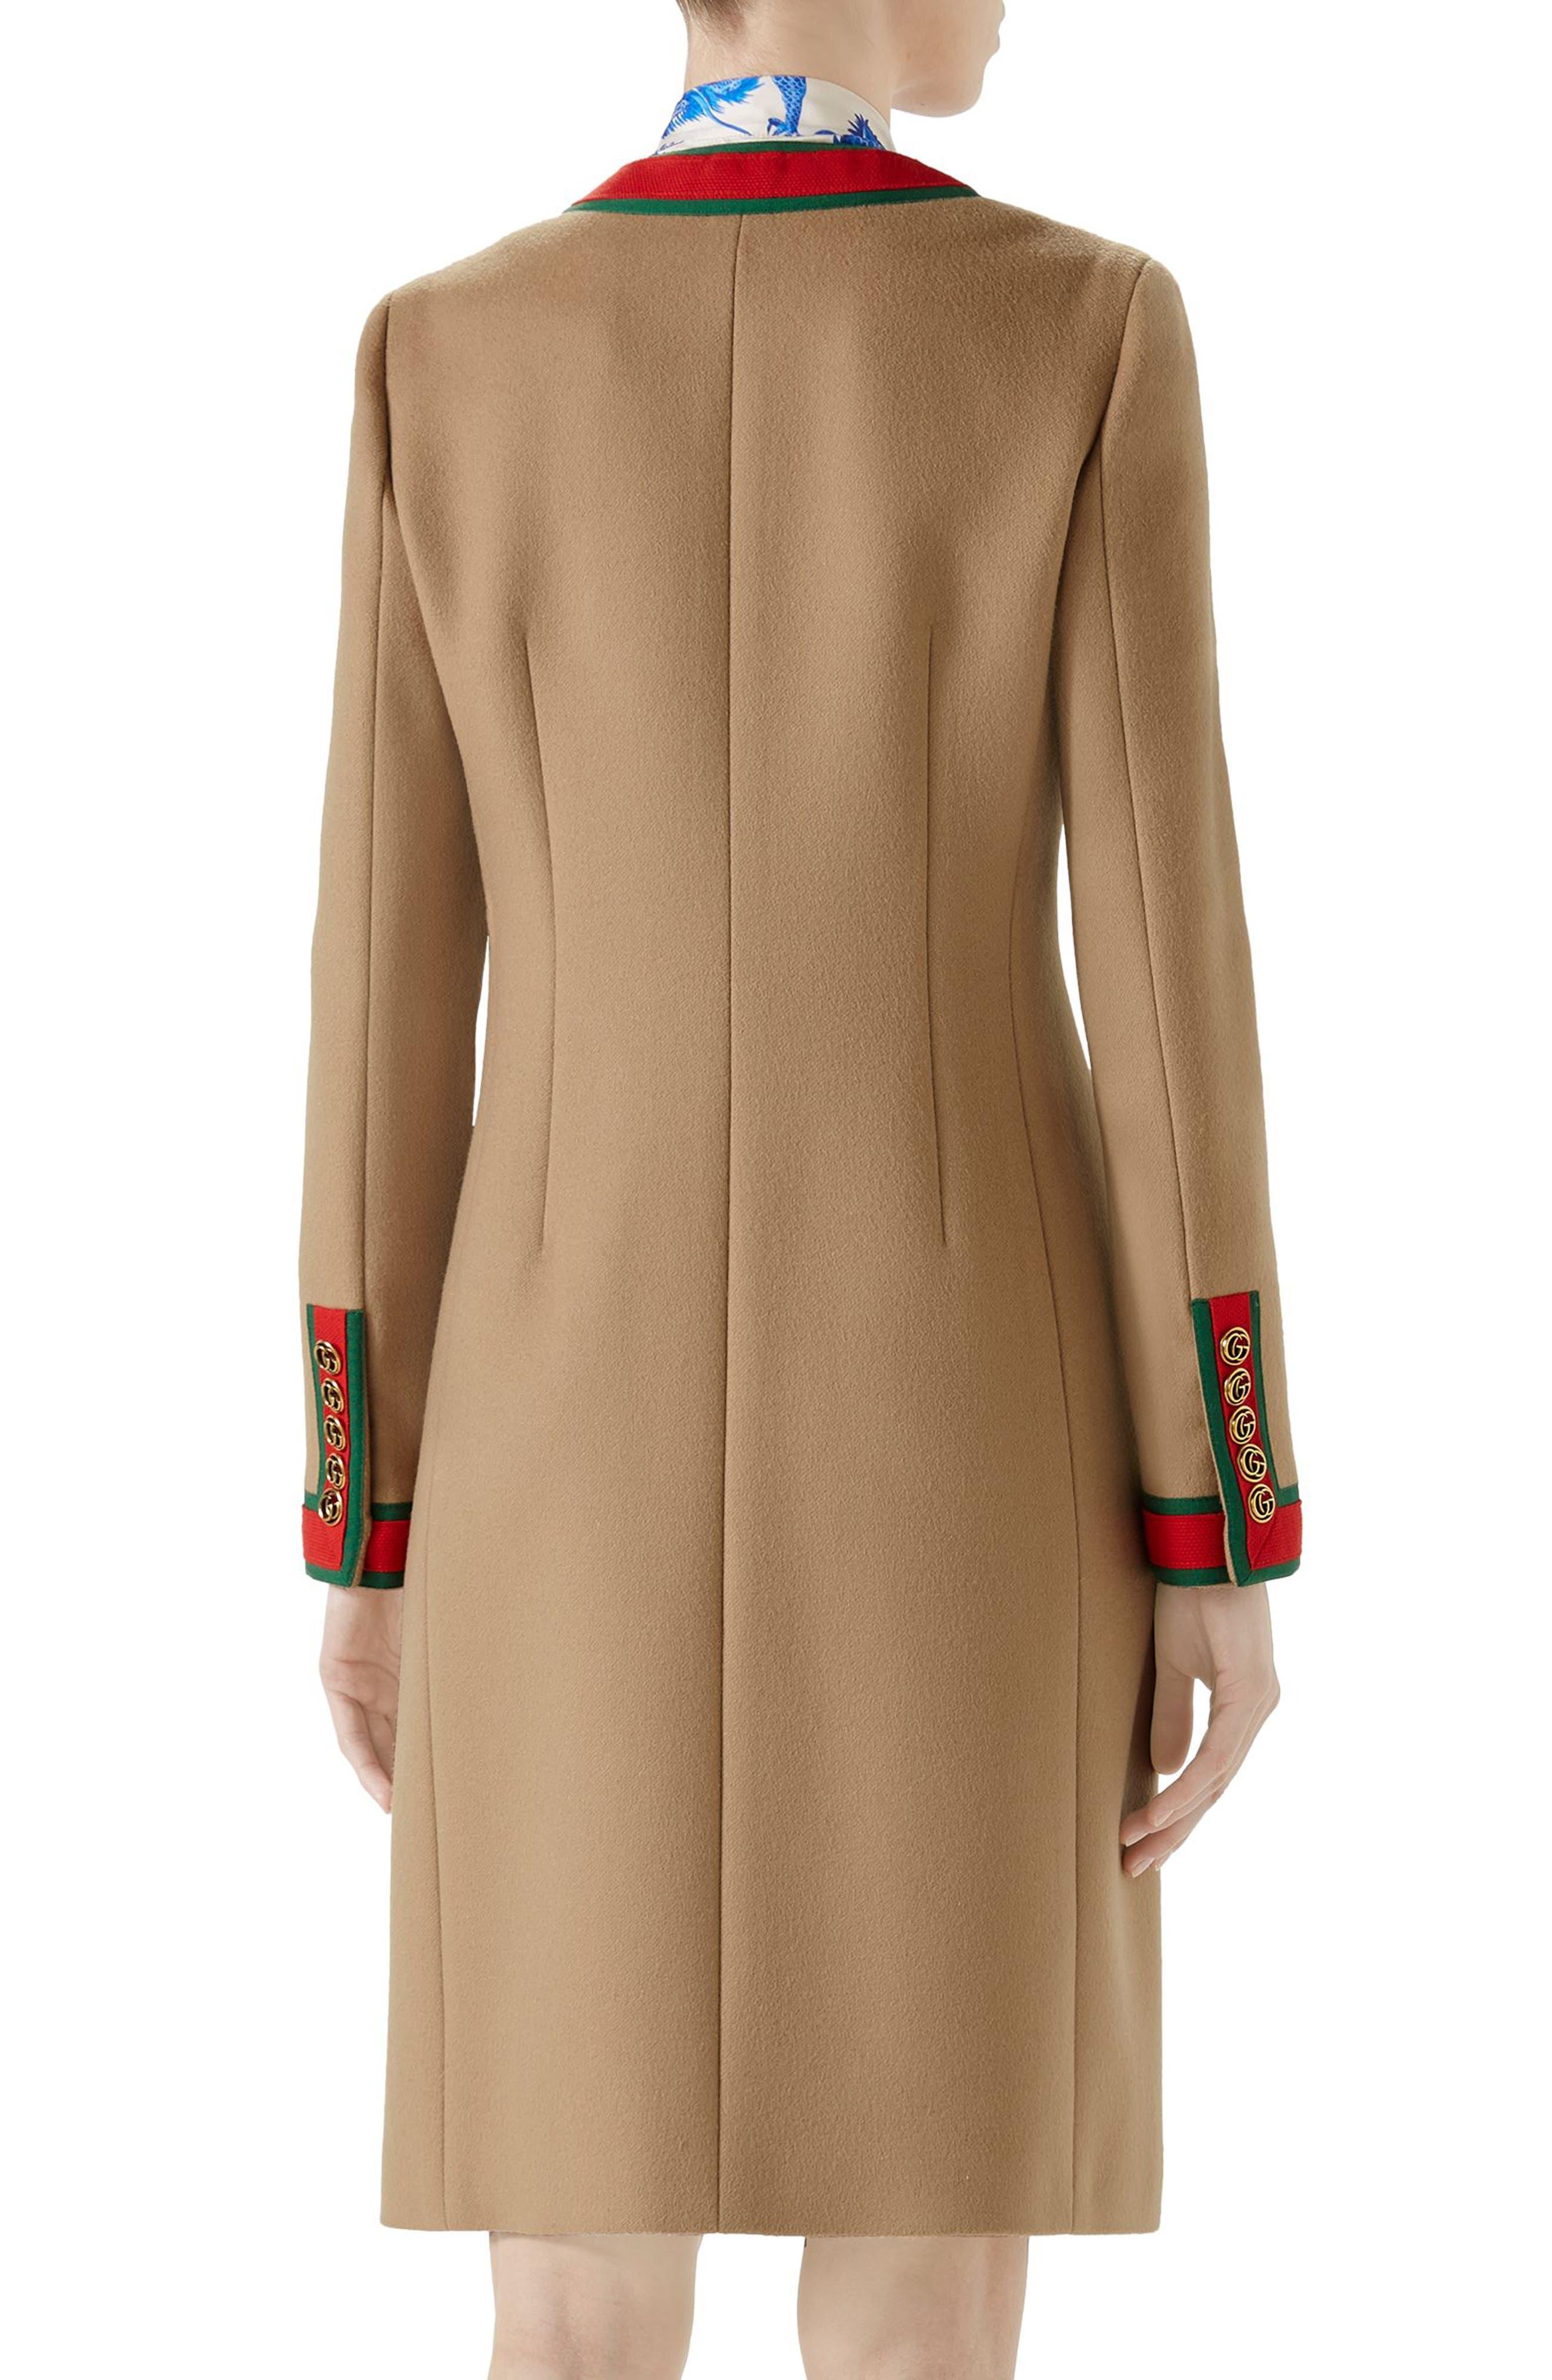 Wool Stripe Trim Coat,                             Alternate thumbnail 2, color,                             CAMEL